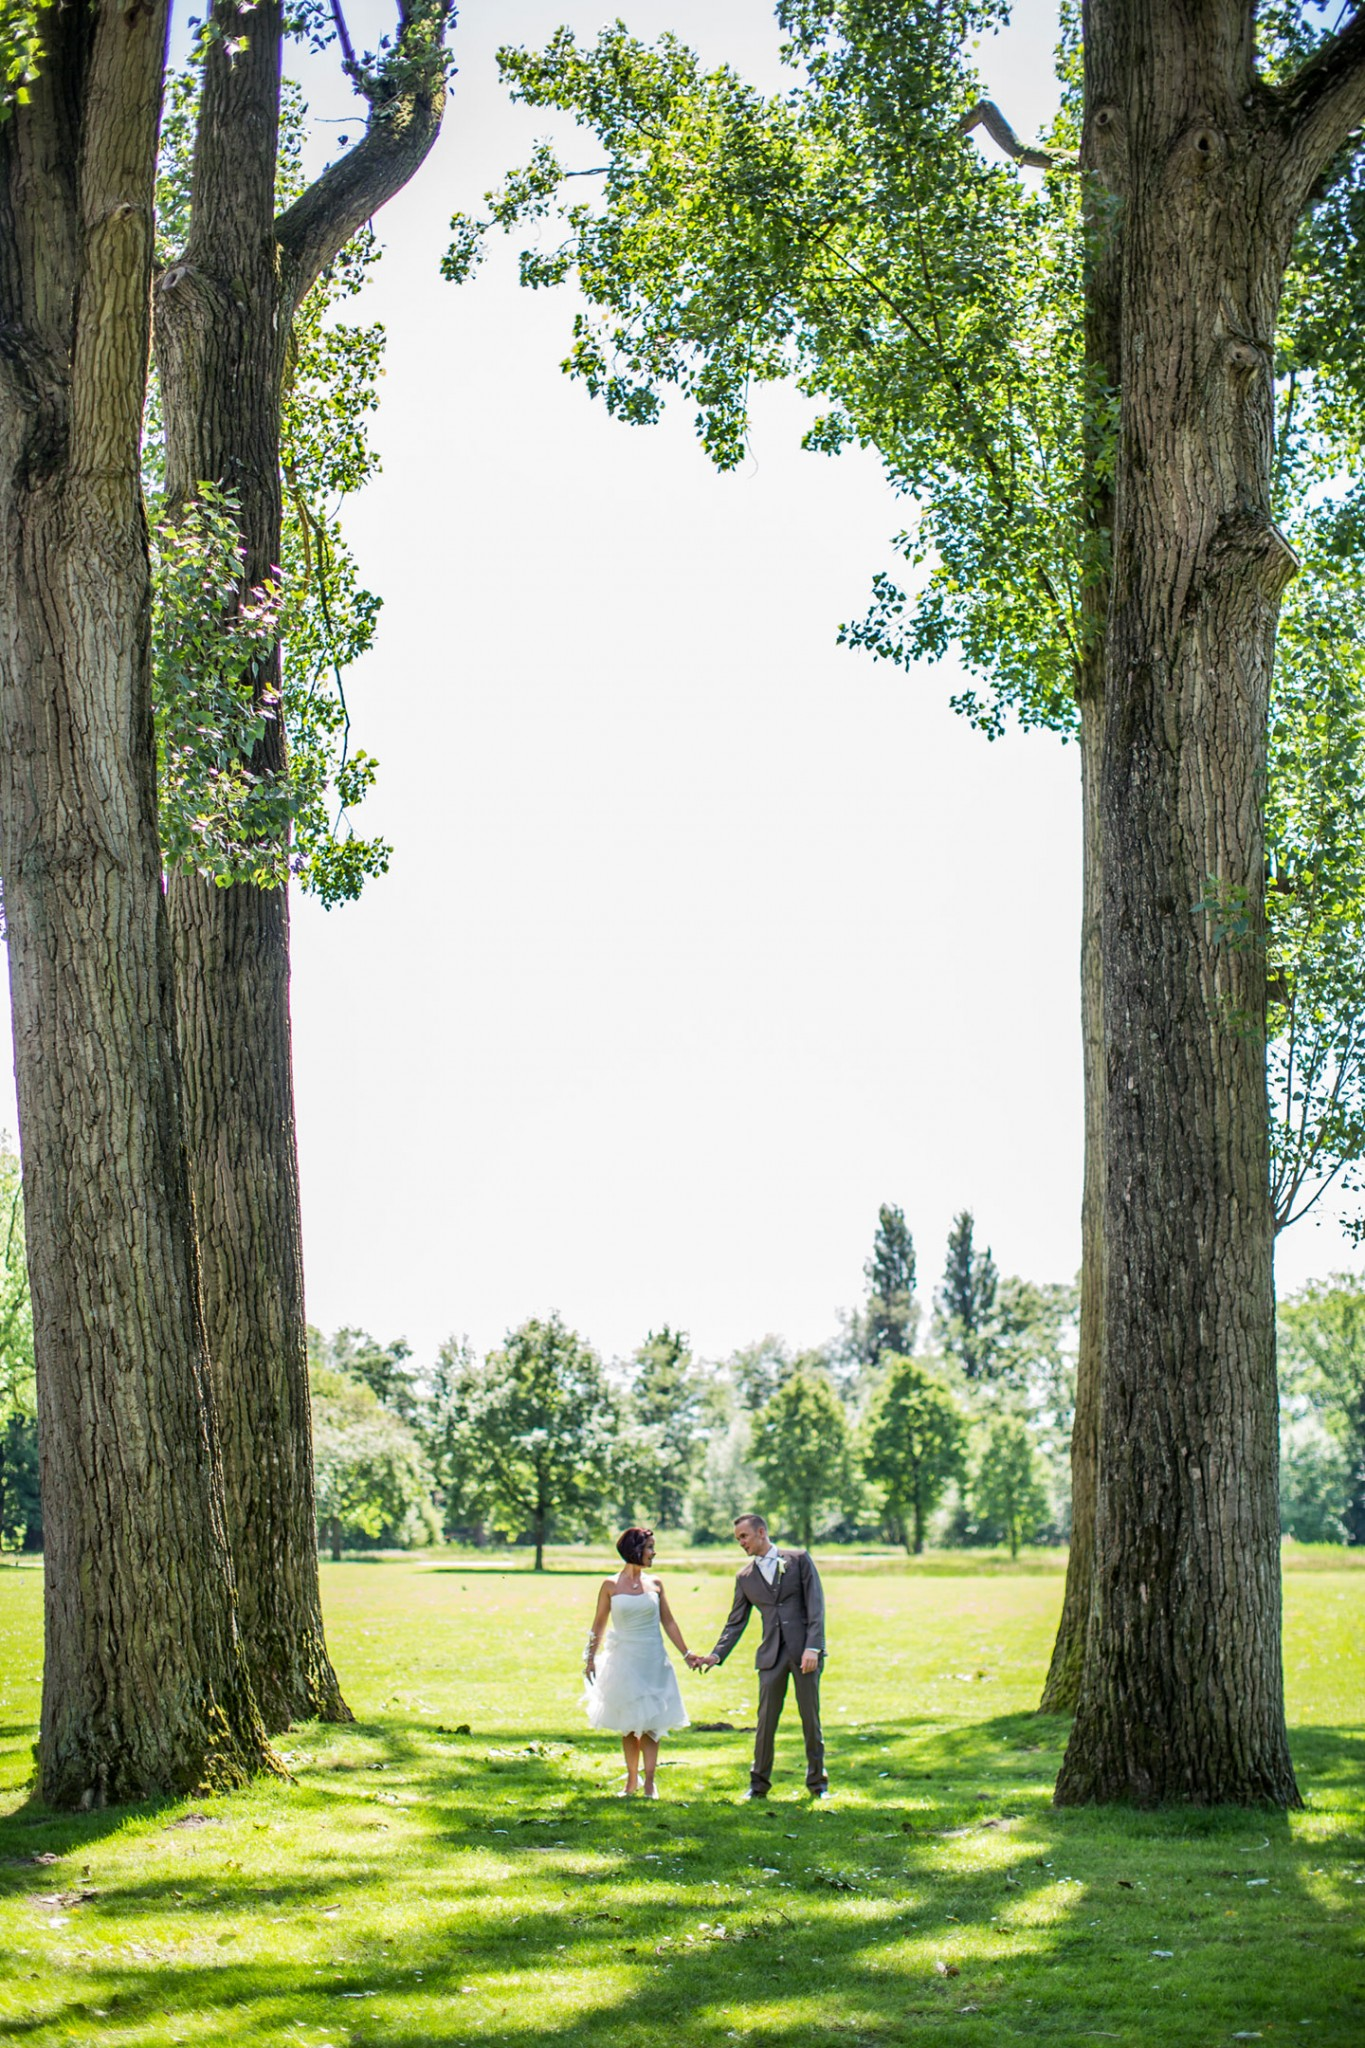 10-Tilburg-bruidsfotografie-trouwfotograaf